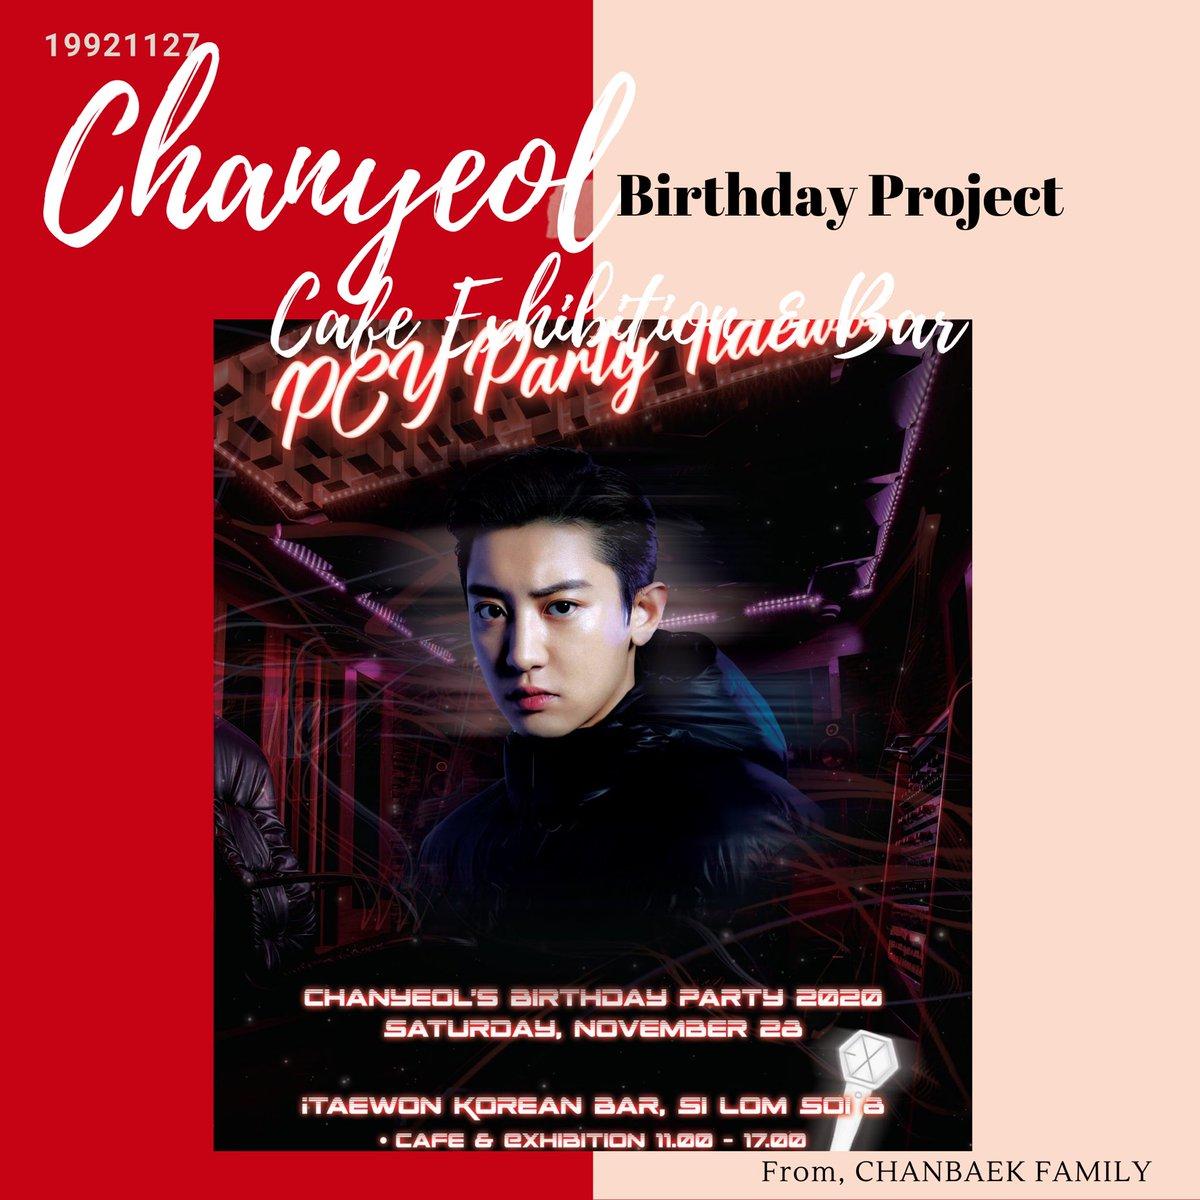 Chanbaek Family Ì°¬ë°± On Twitter Chanyeol S Birthday Project 2020 Part 5 Youtube Ad 2020 11 26 28 Https T Co U7ugdik0ii